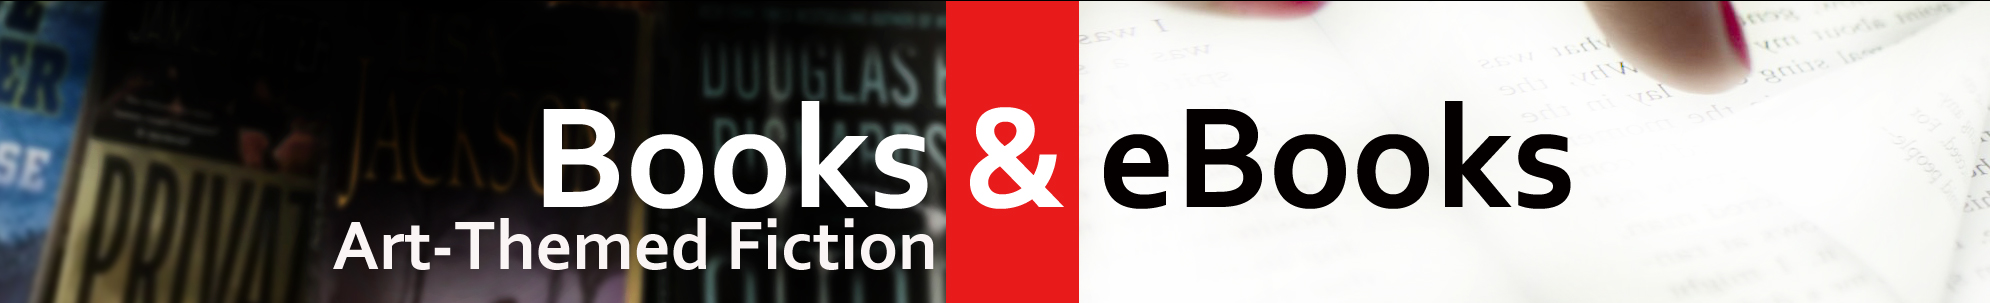 Art-Themed Fiction banner image